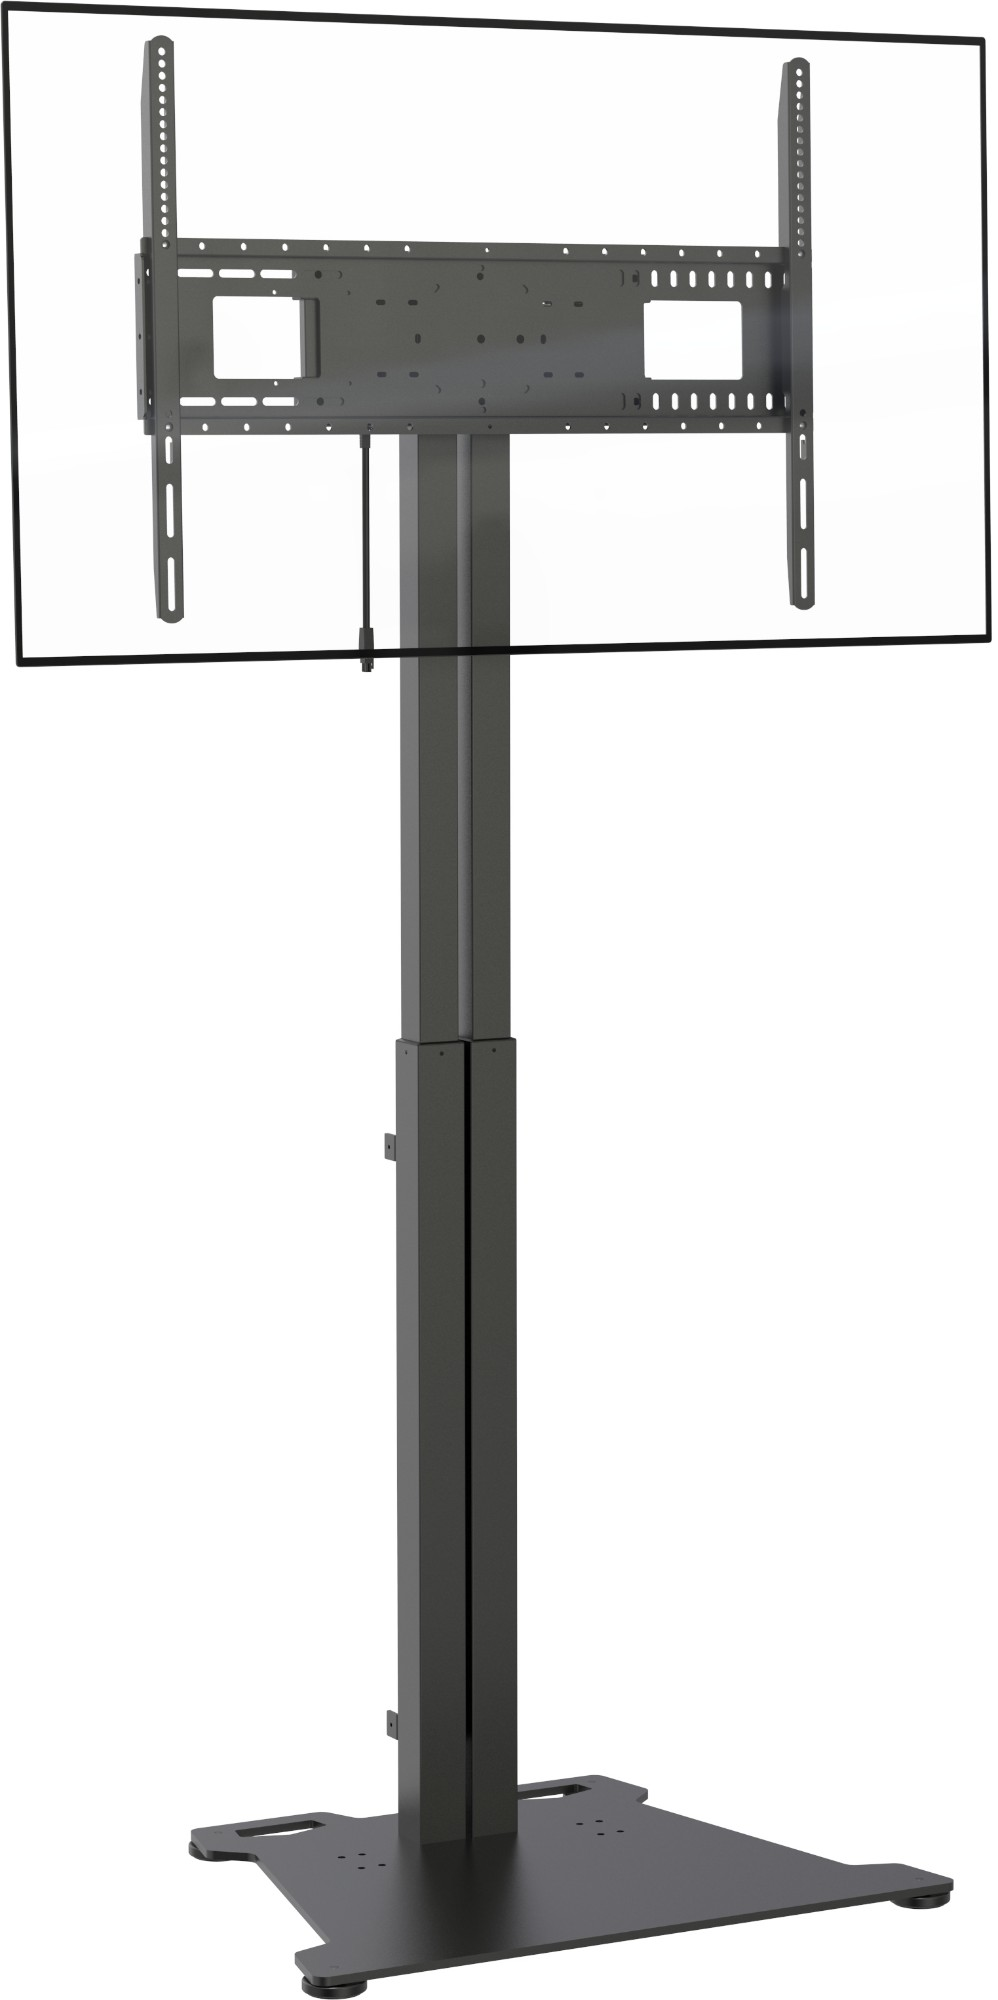 "Vision VFM-F30/FP soporte de mesa para pantalla plana 2,29 m (90"") Negro"